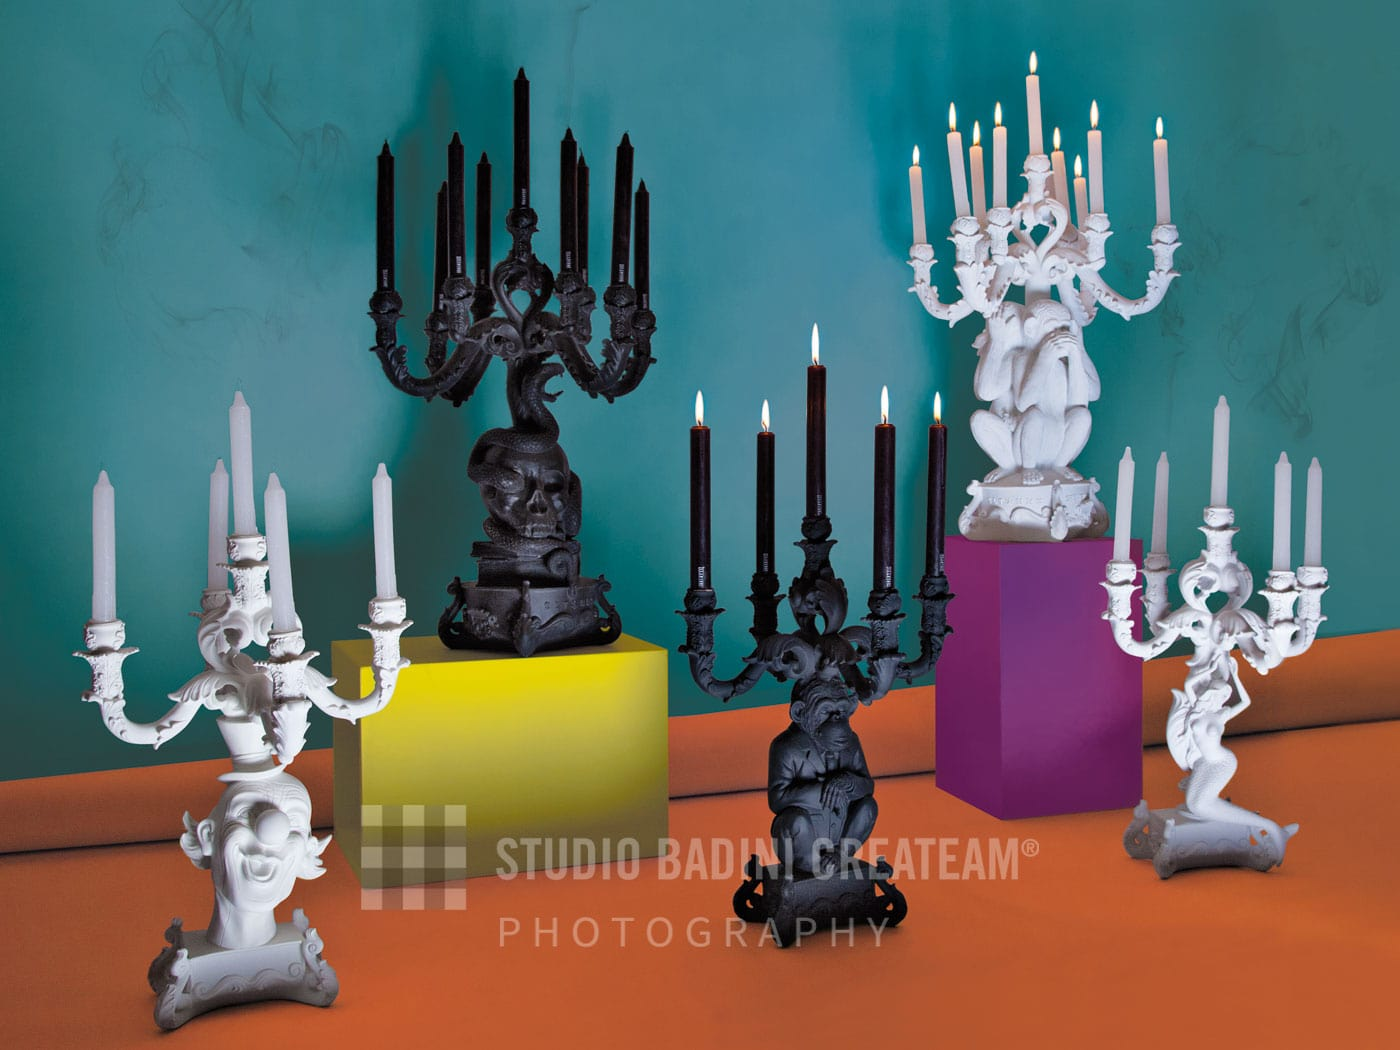 Badini Creative Studio - fotografia - seletti - burlesque